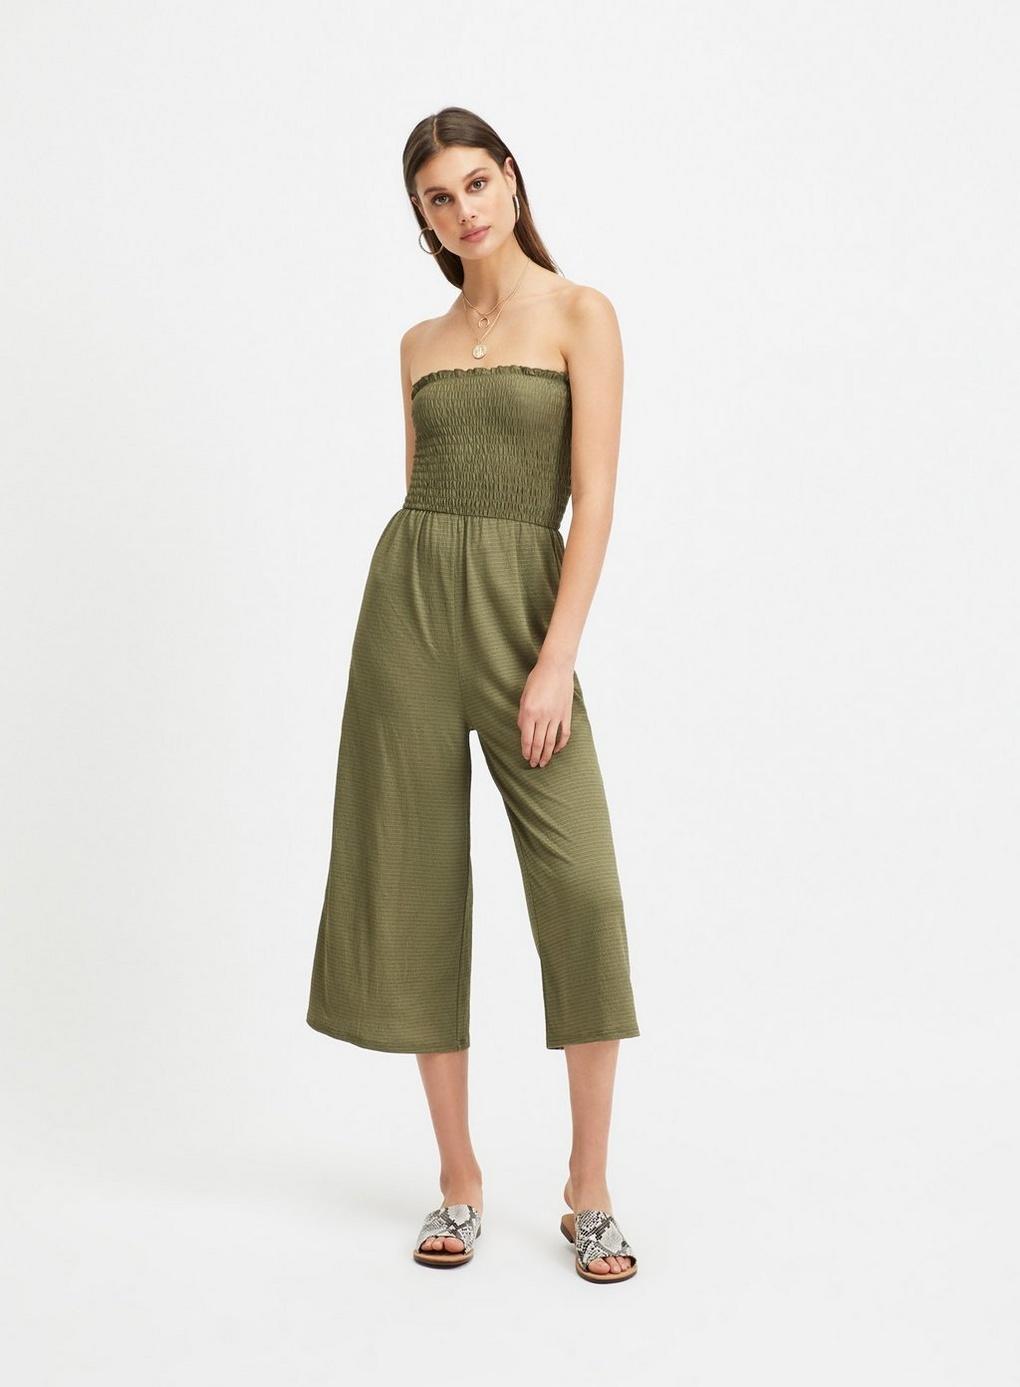 a21acb83345 Miss Selfridge Khaki Shirred Bandeau Wide Leg Jumpsuit in Green - Lyst